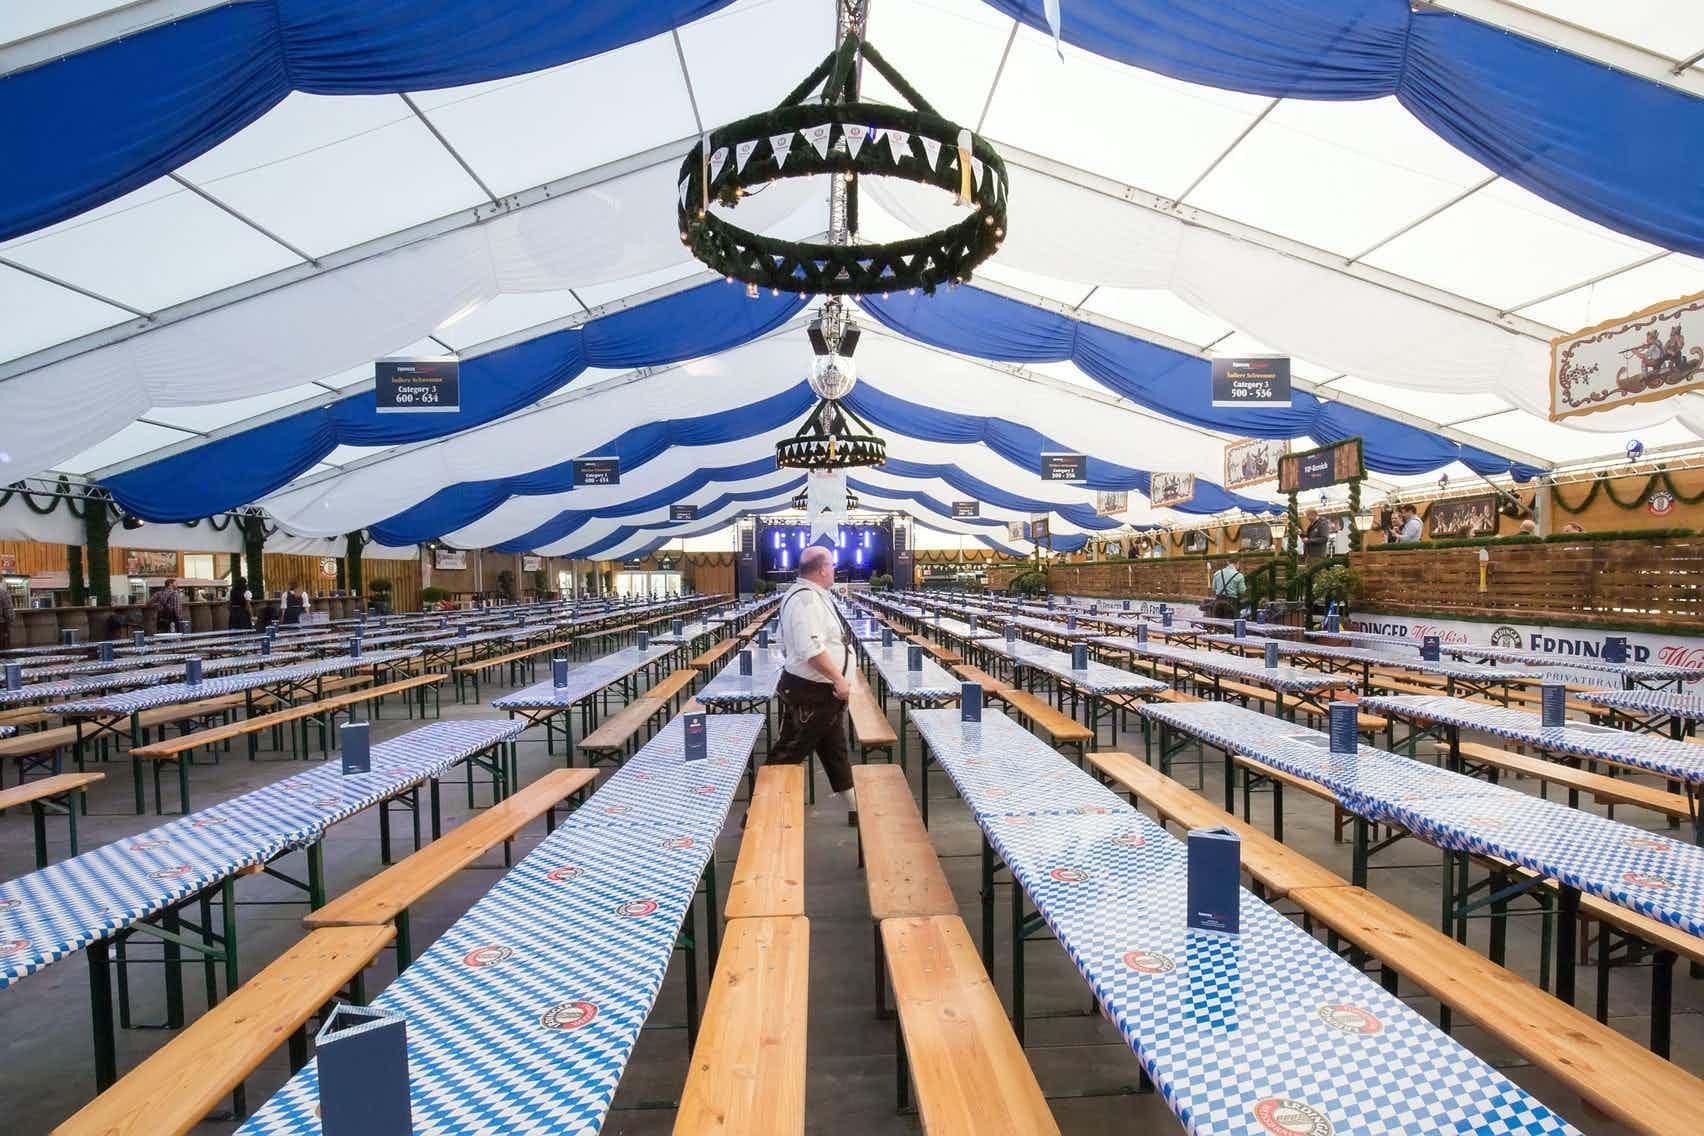 Erdinger Oktoberfest London, Queen Elizabeth Olympic Park / Stratford Waterfront